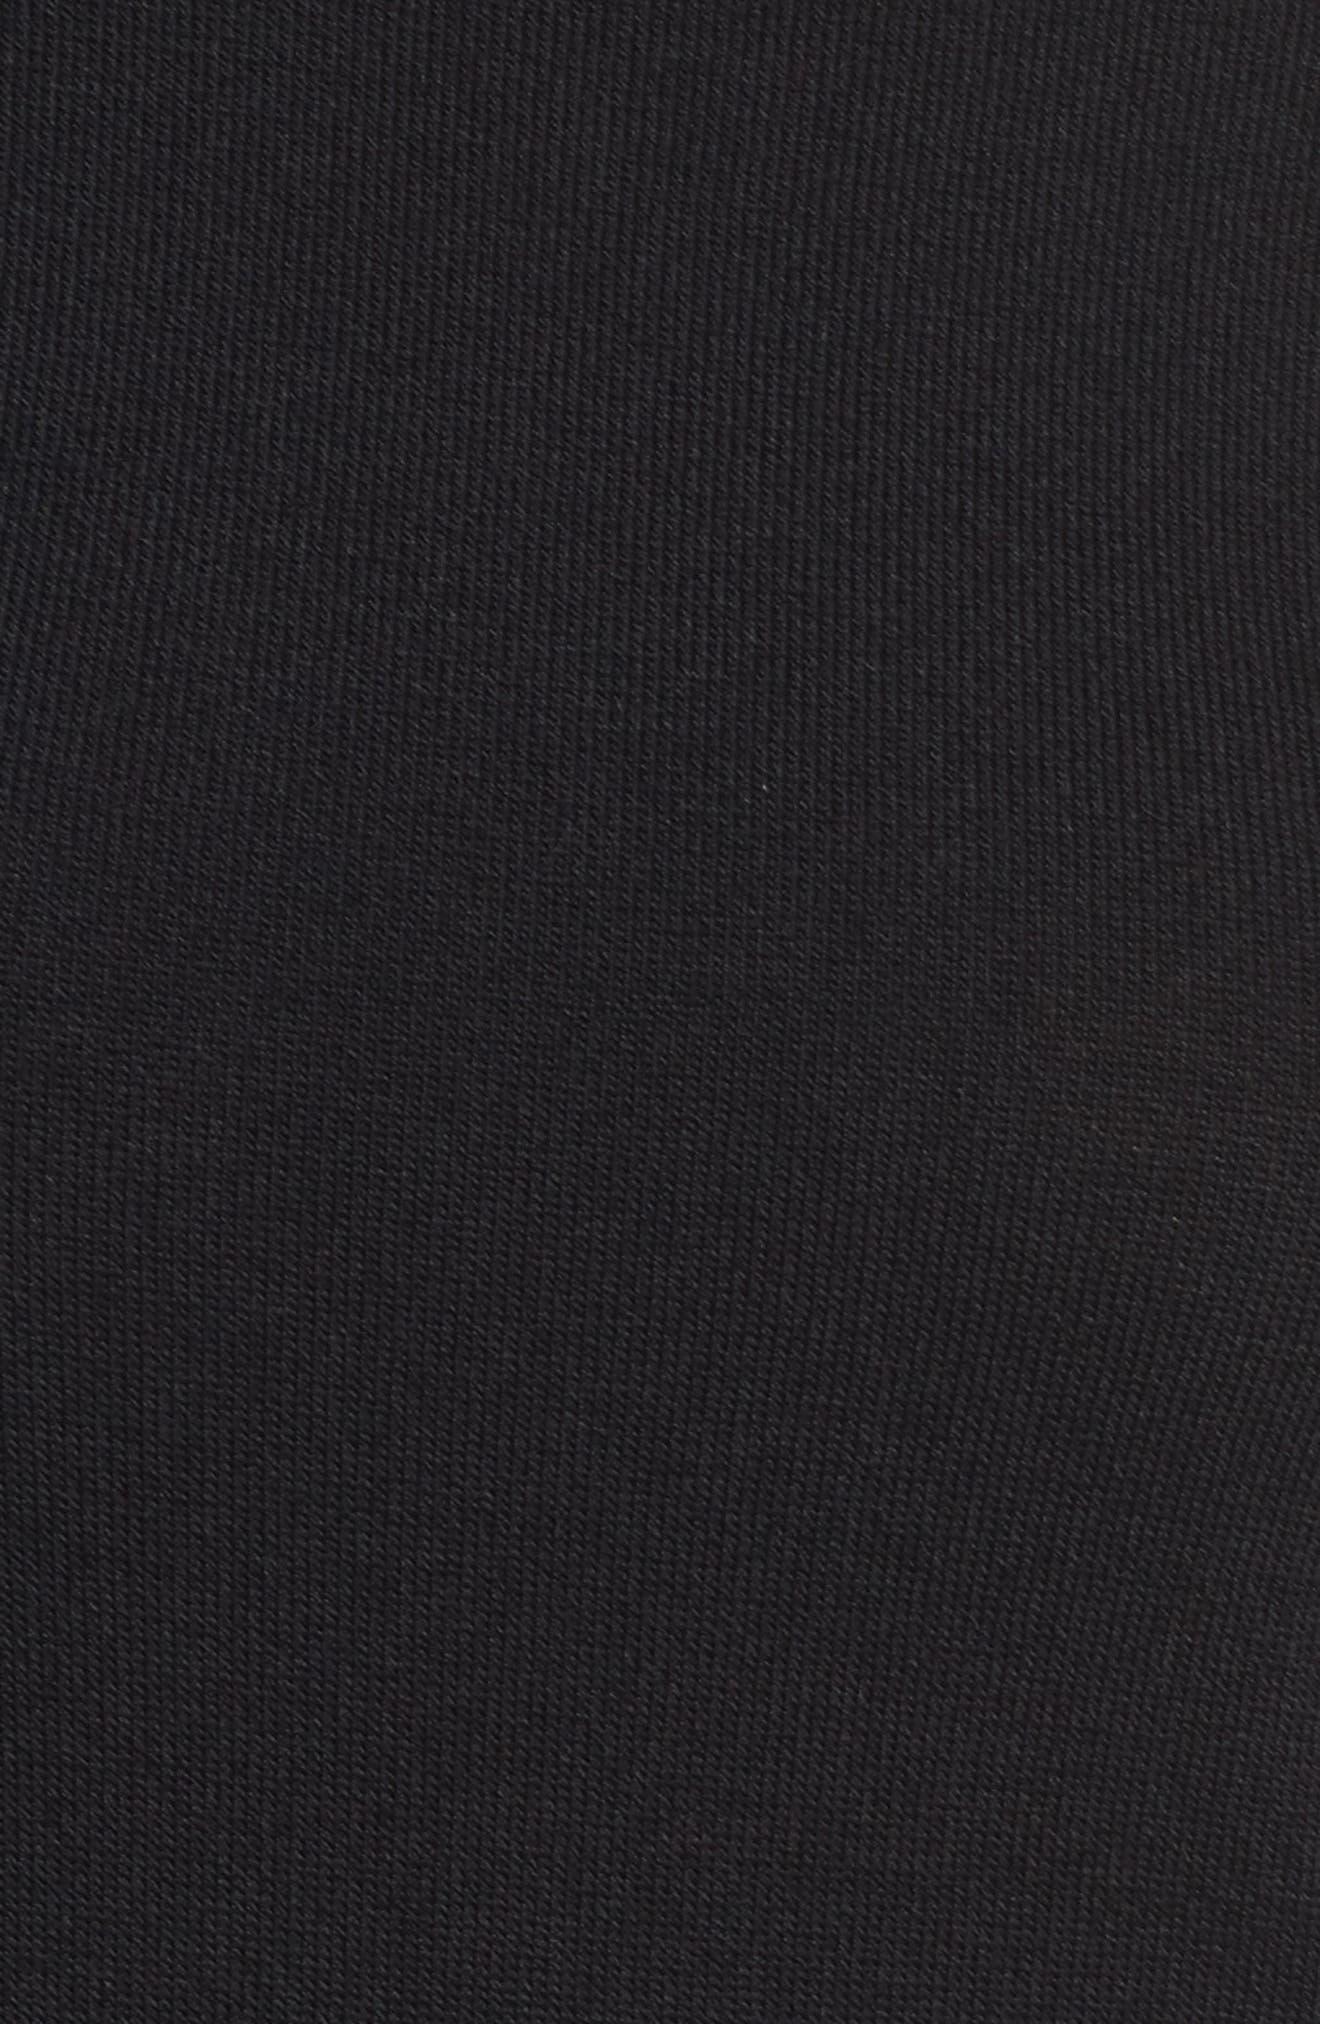 Bell Sleeve Fit & Flare Dress,                             Alternate thumbnail 5, color,                             Black/ Ivory